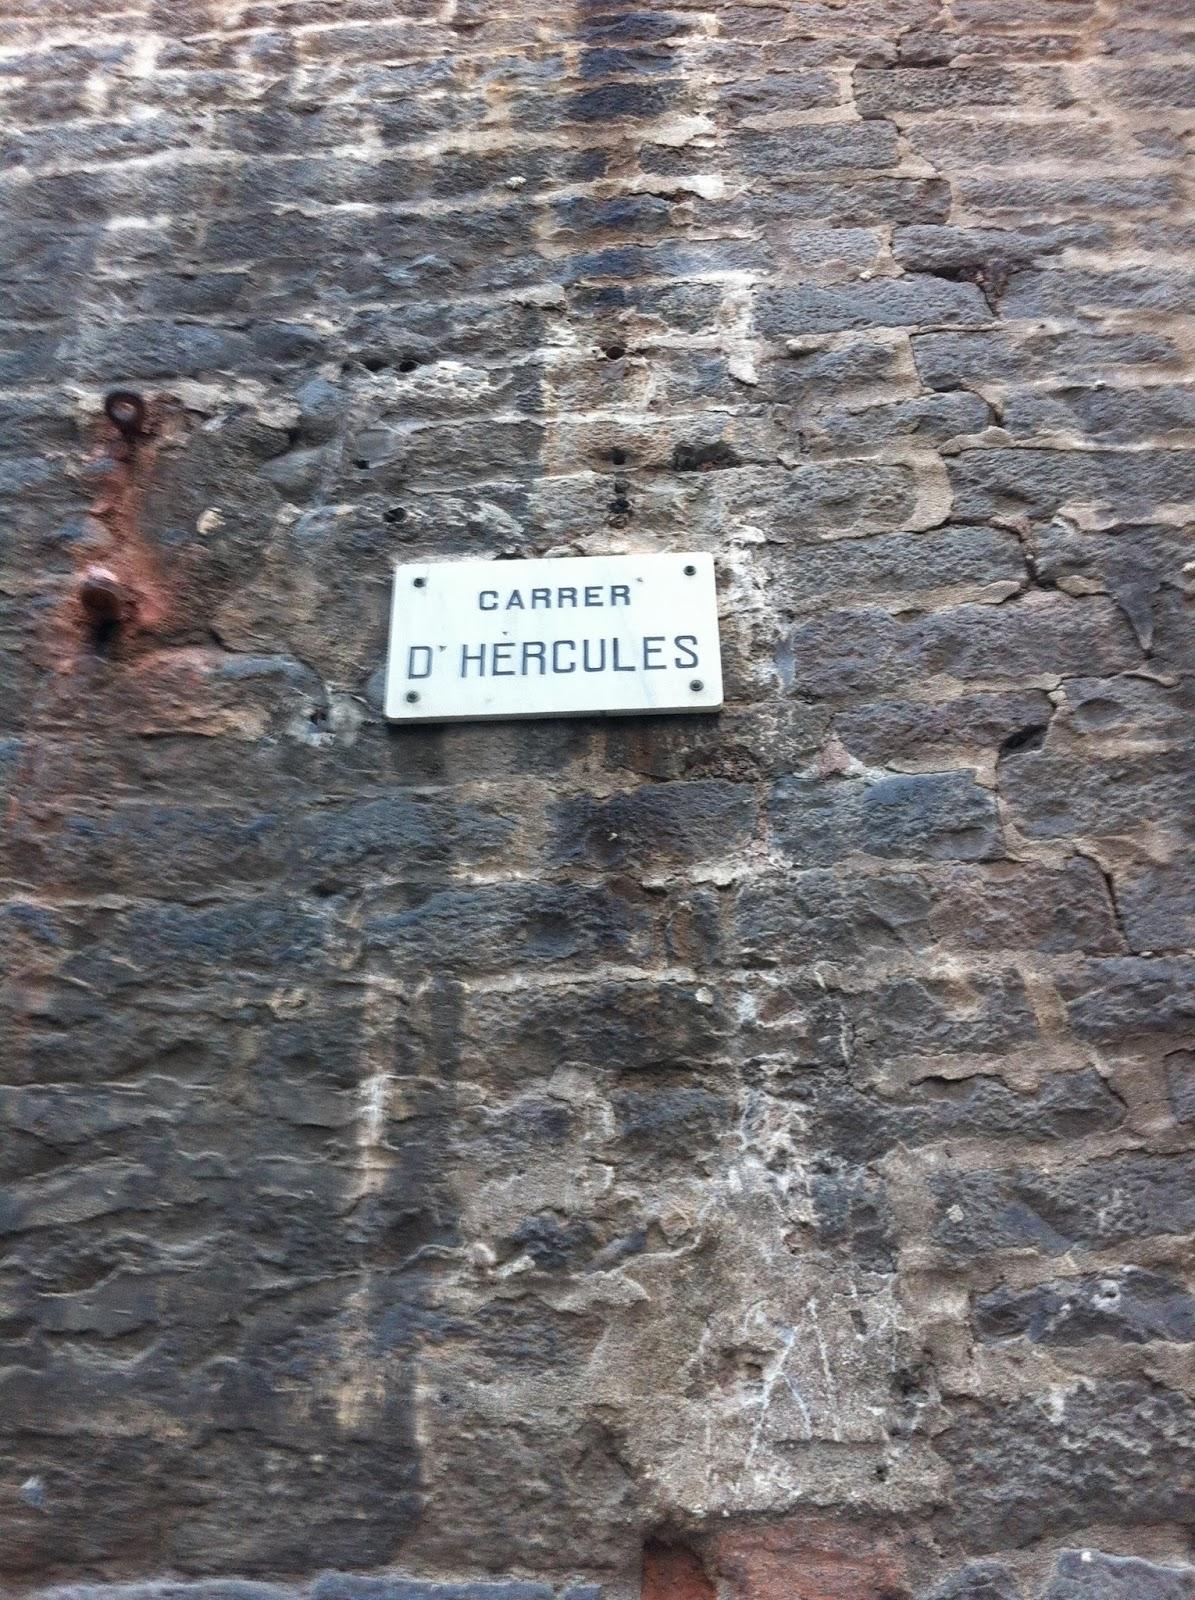 Hercules BArcelona MundoBArcino